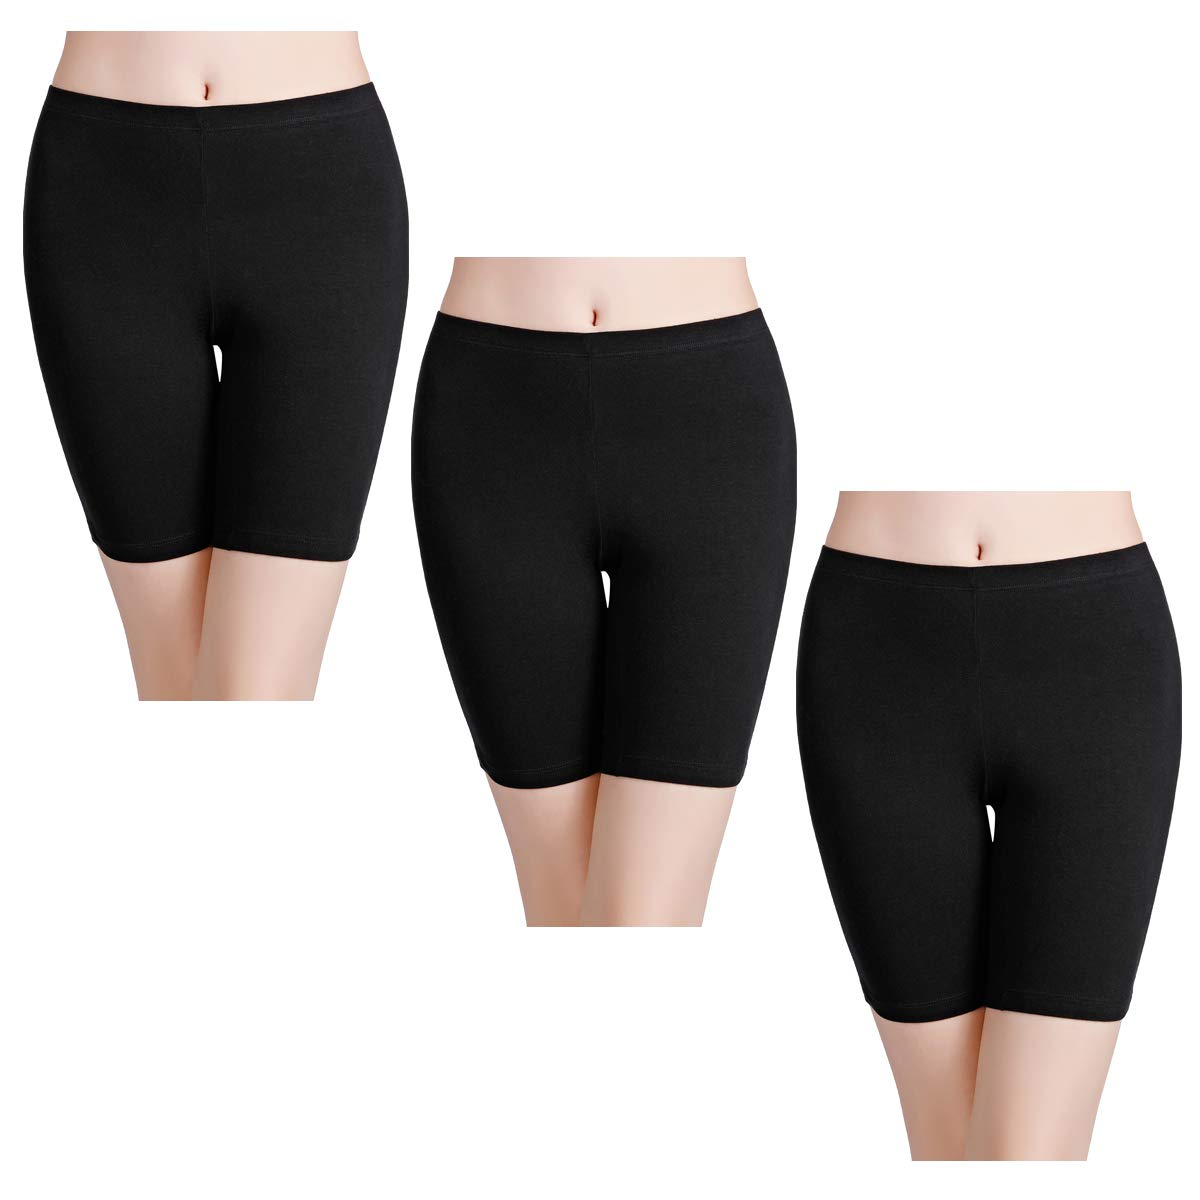 Black Retro Shorts with Hot Pink Trim Extra Sm CUTE!!